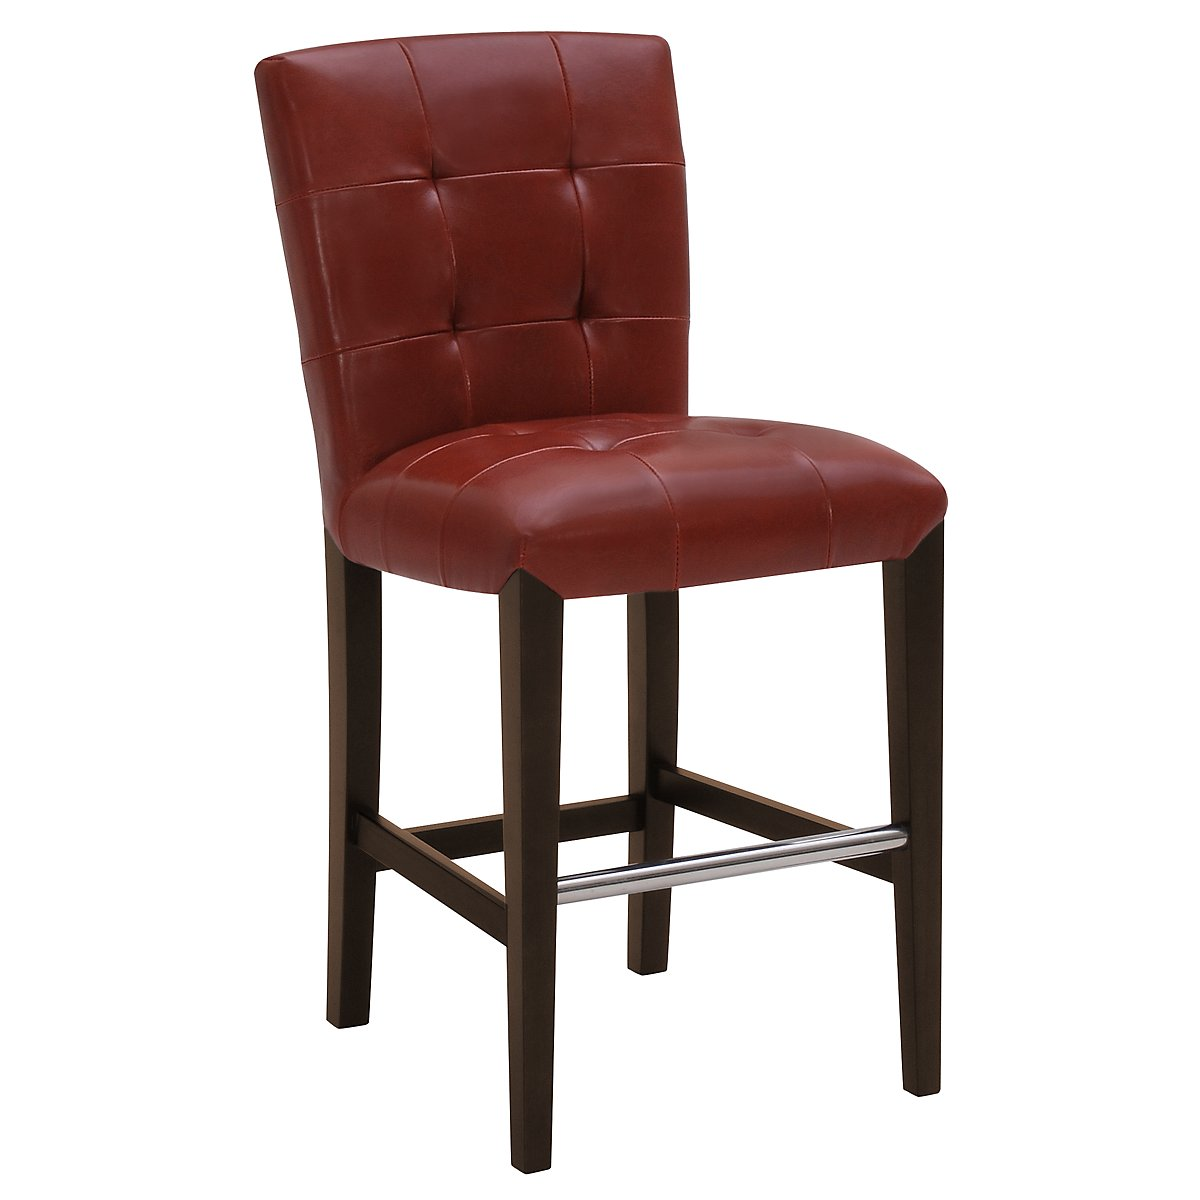 "Trisha Red Bonded Leather 24"" Upholstered Barstool"